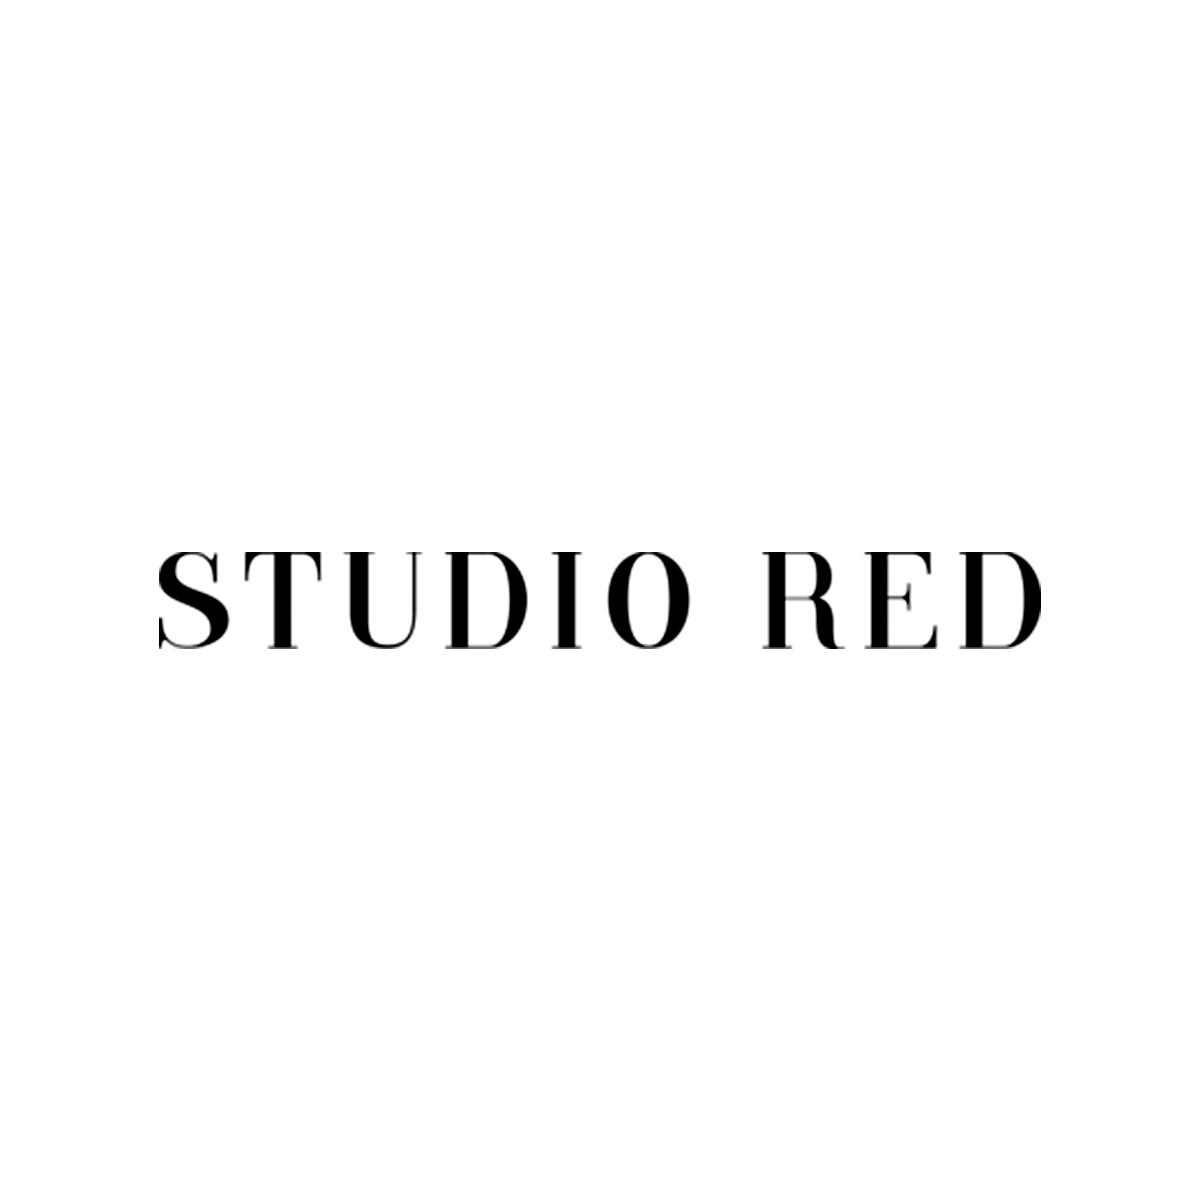 StudioRed.jpg